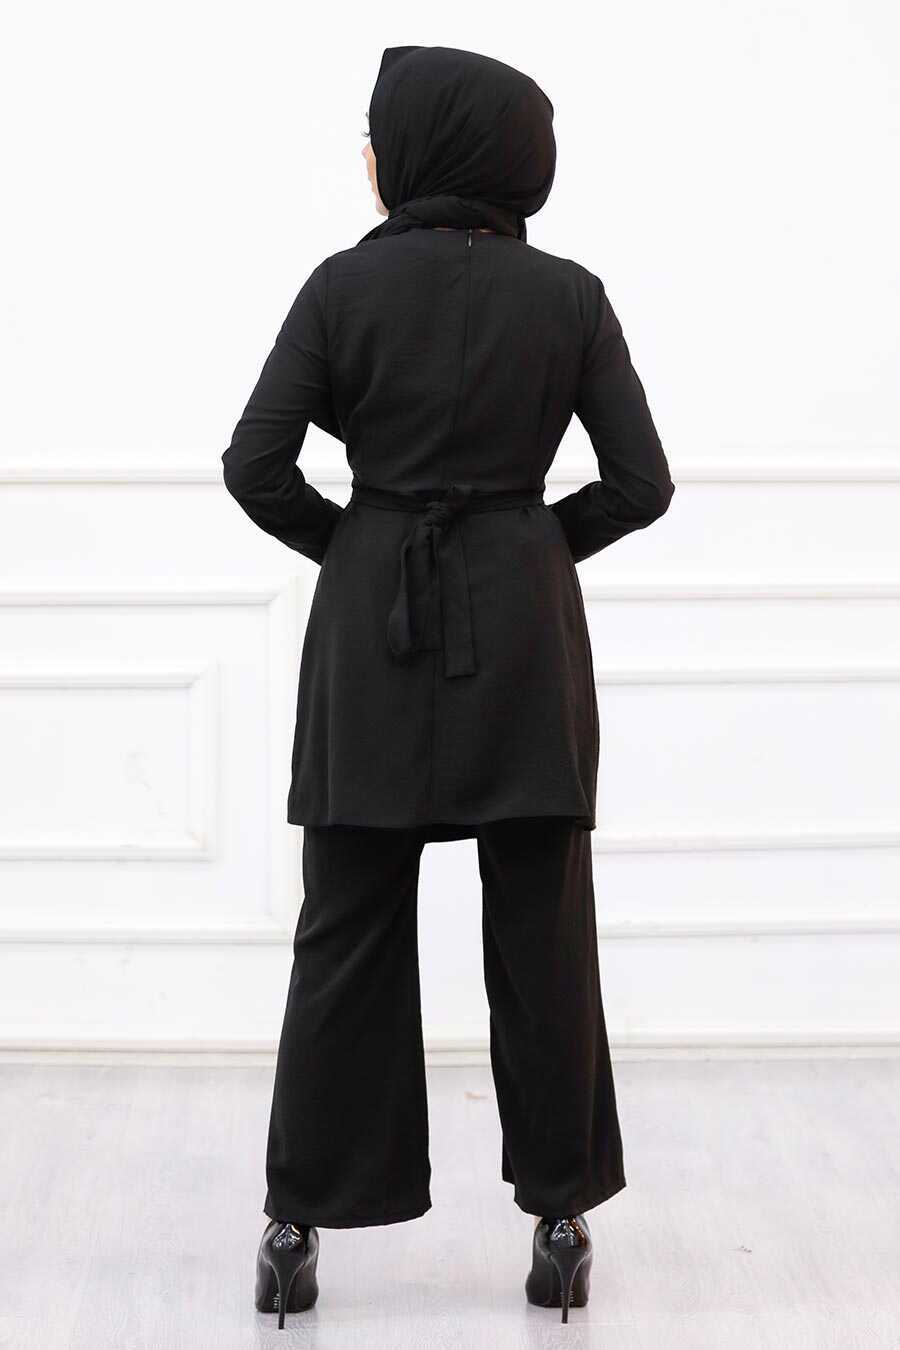 Black Hijab Suit Dress 3000S